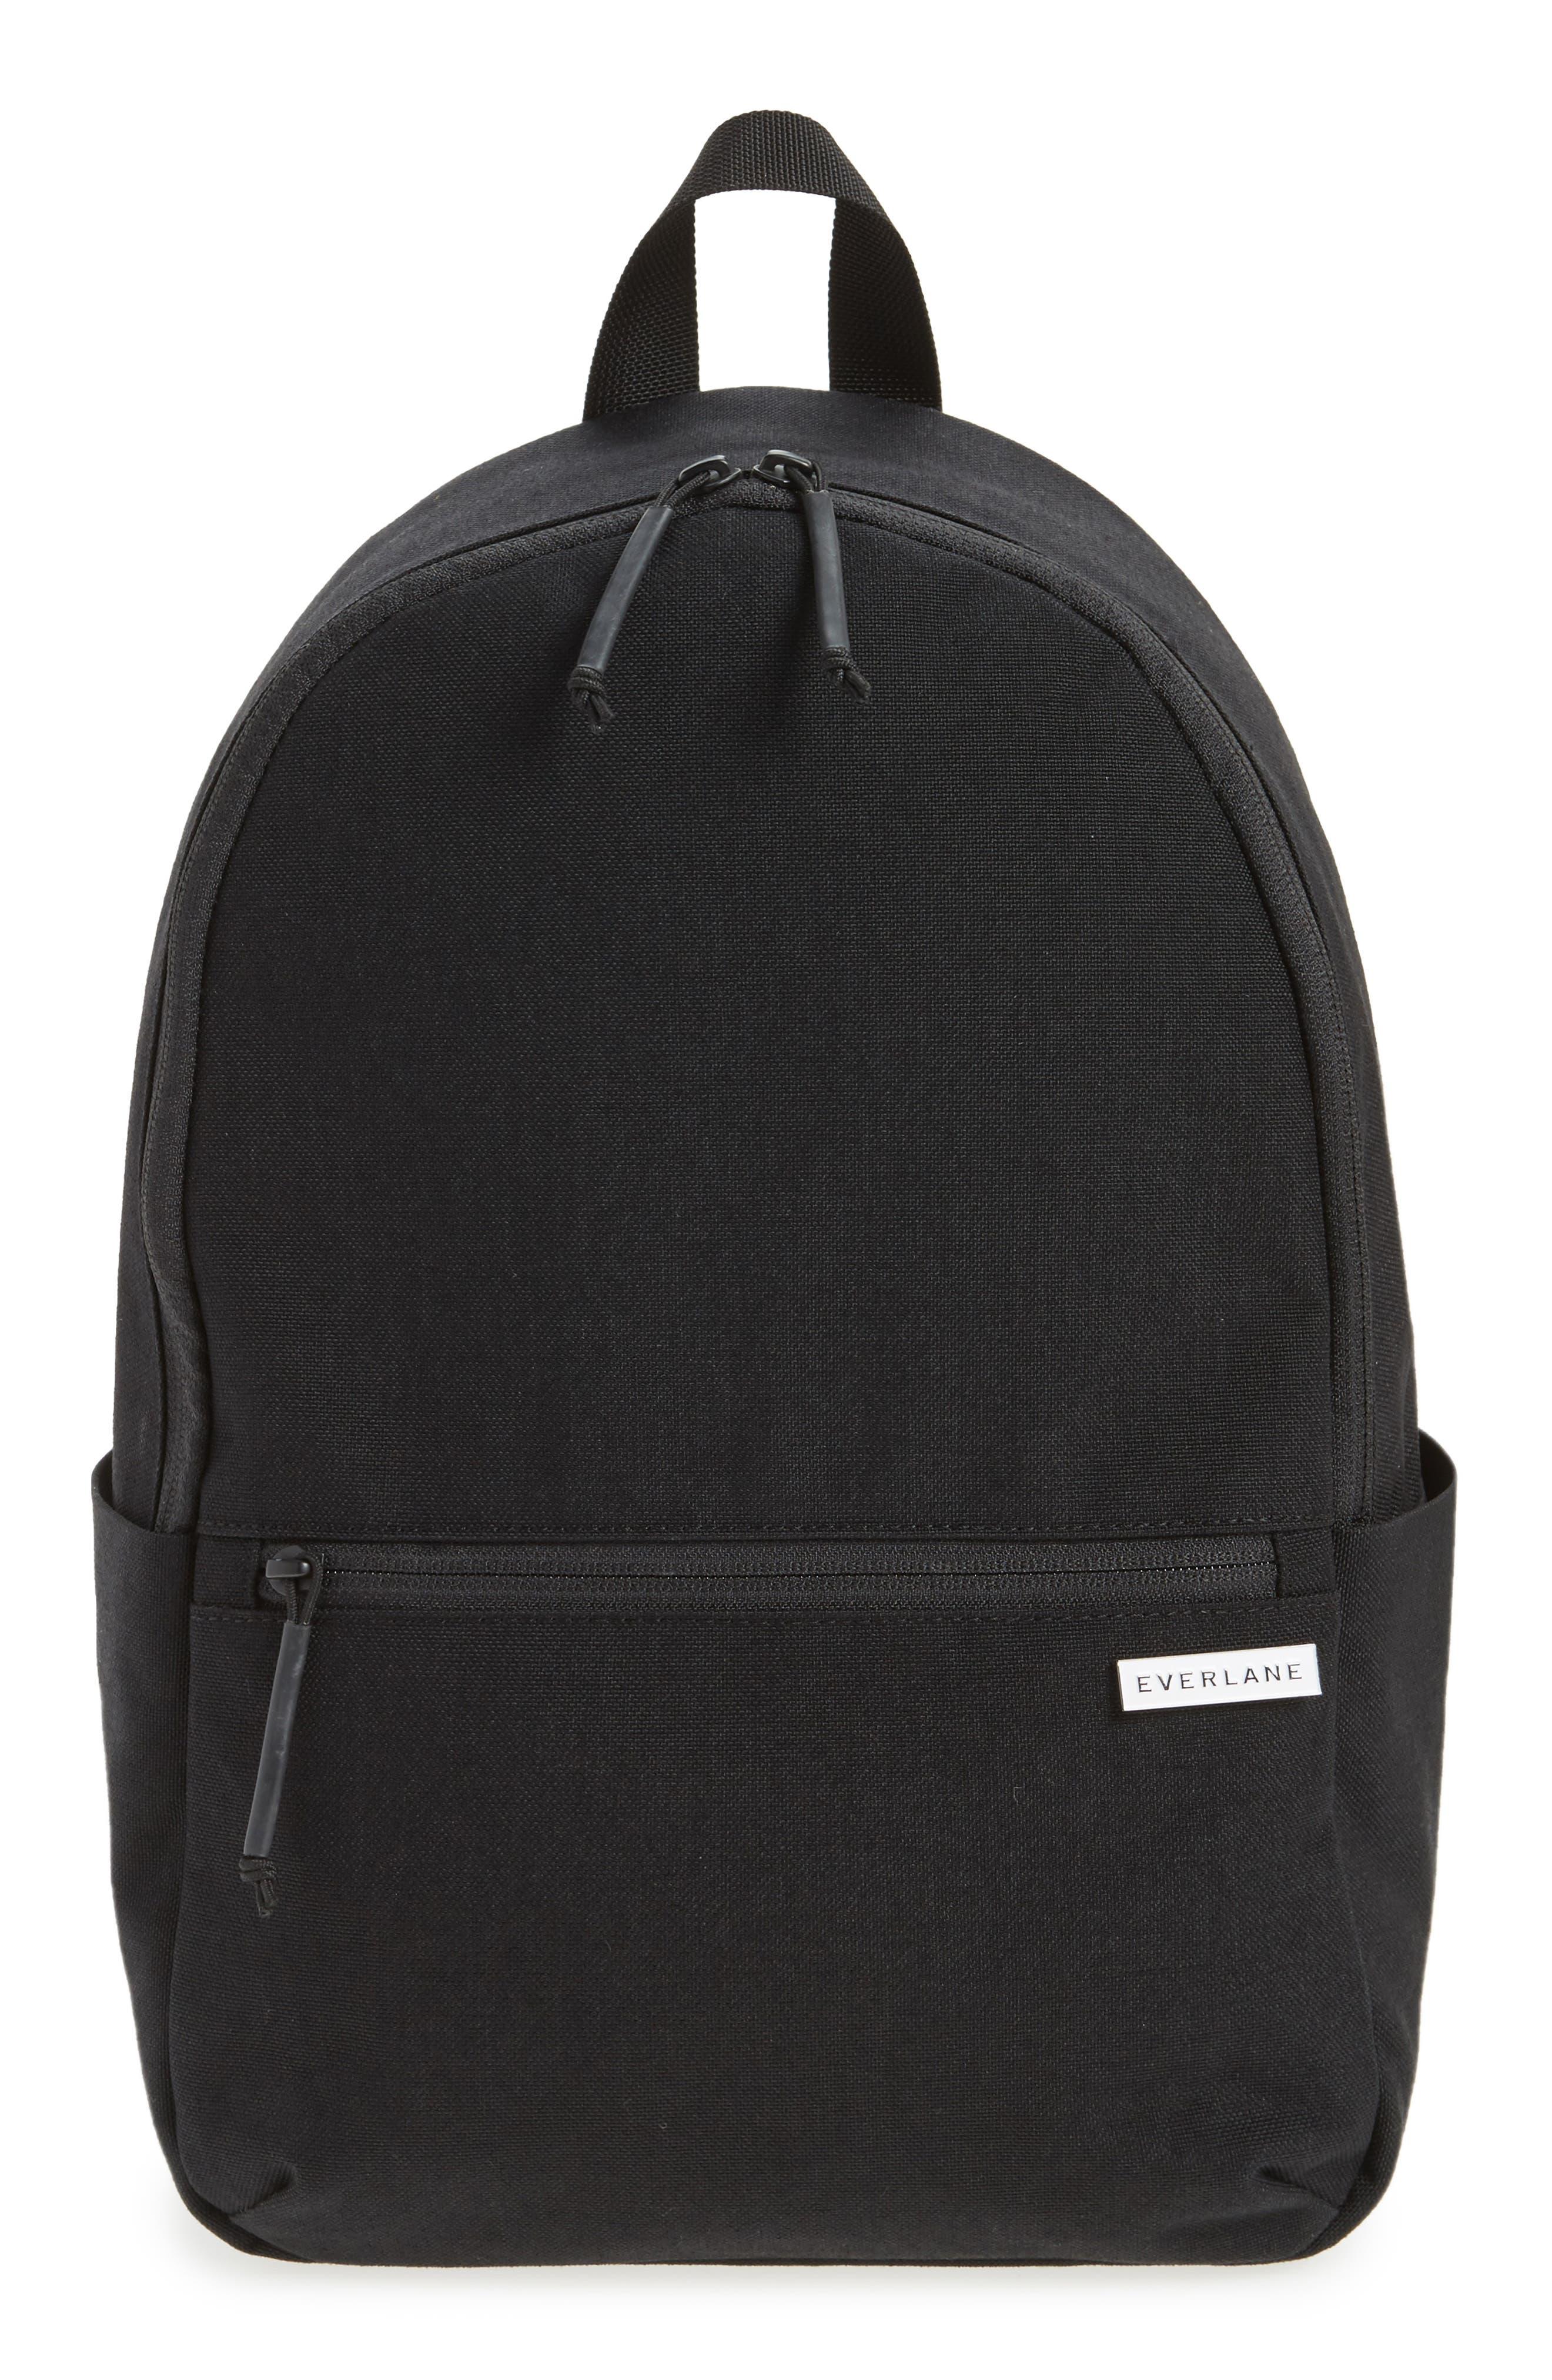 Alternate Image 1 Selected - Everlane The Small Street Nylon Zip Backpack